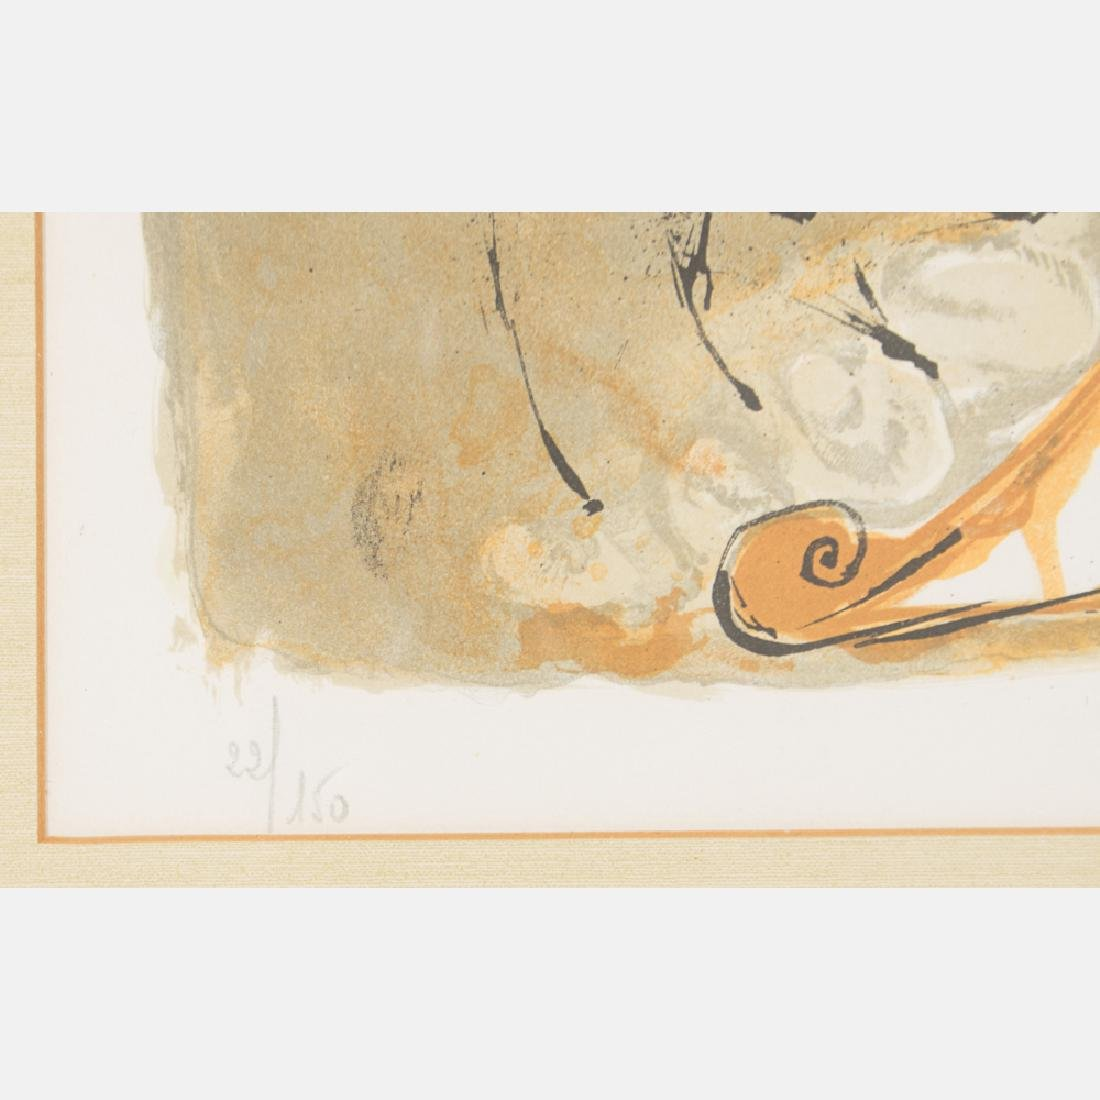 Salvador Dali (1904-1989) Self Portrait Sundial, - 3